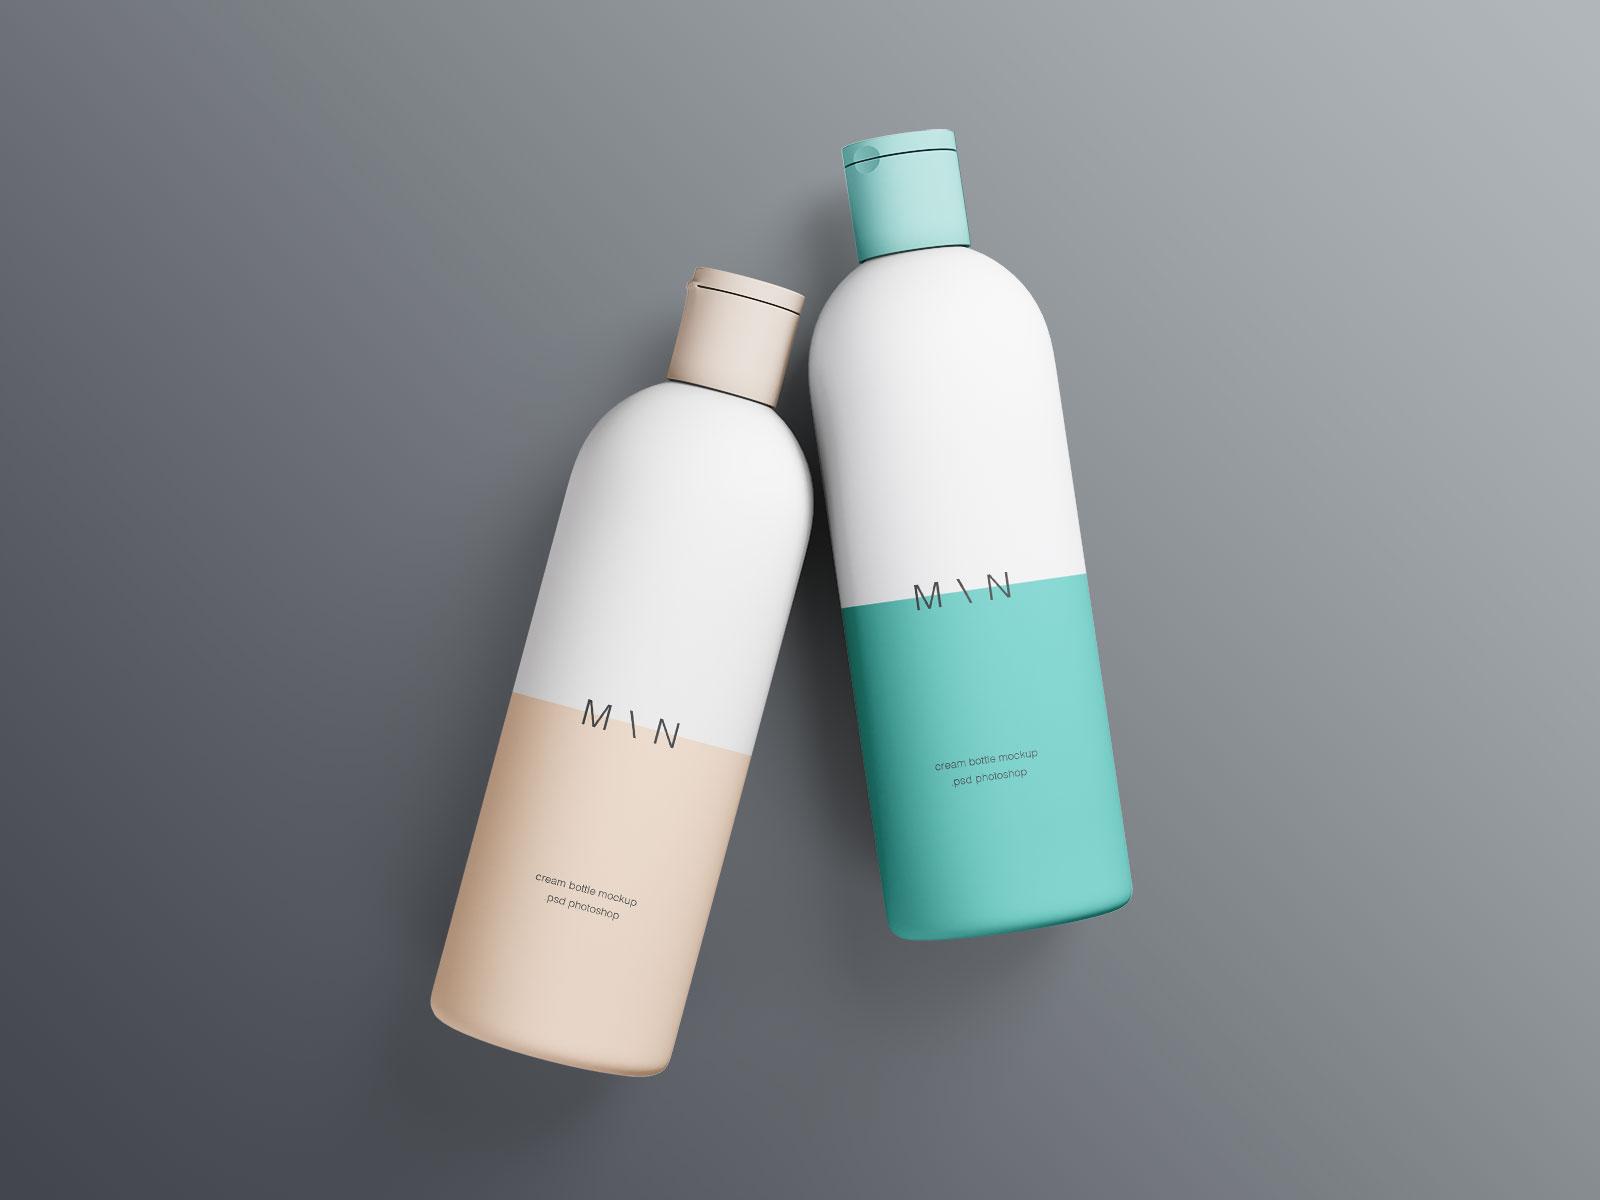 Free-Cosmetic-Cream-Bottle-Mockup-PSD-File-2